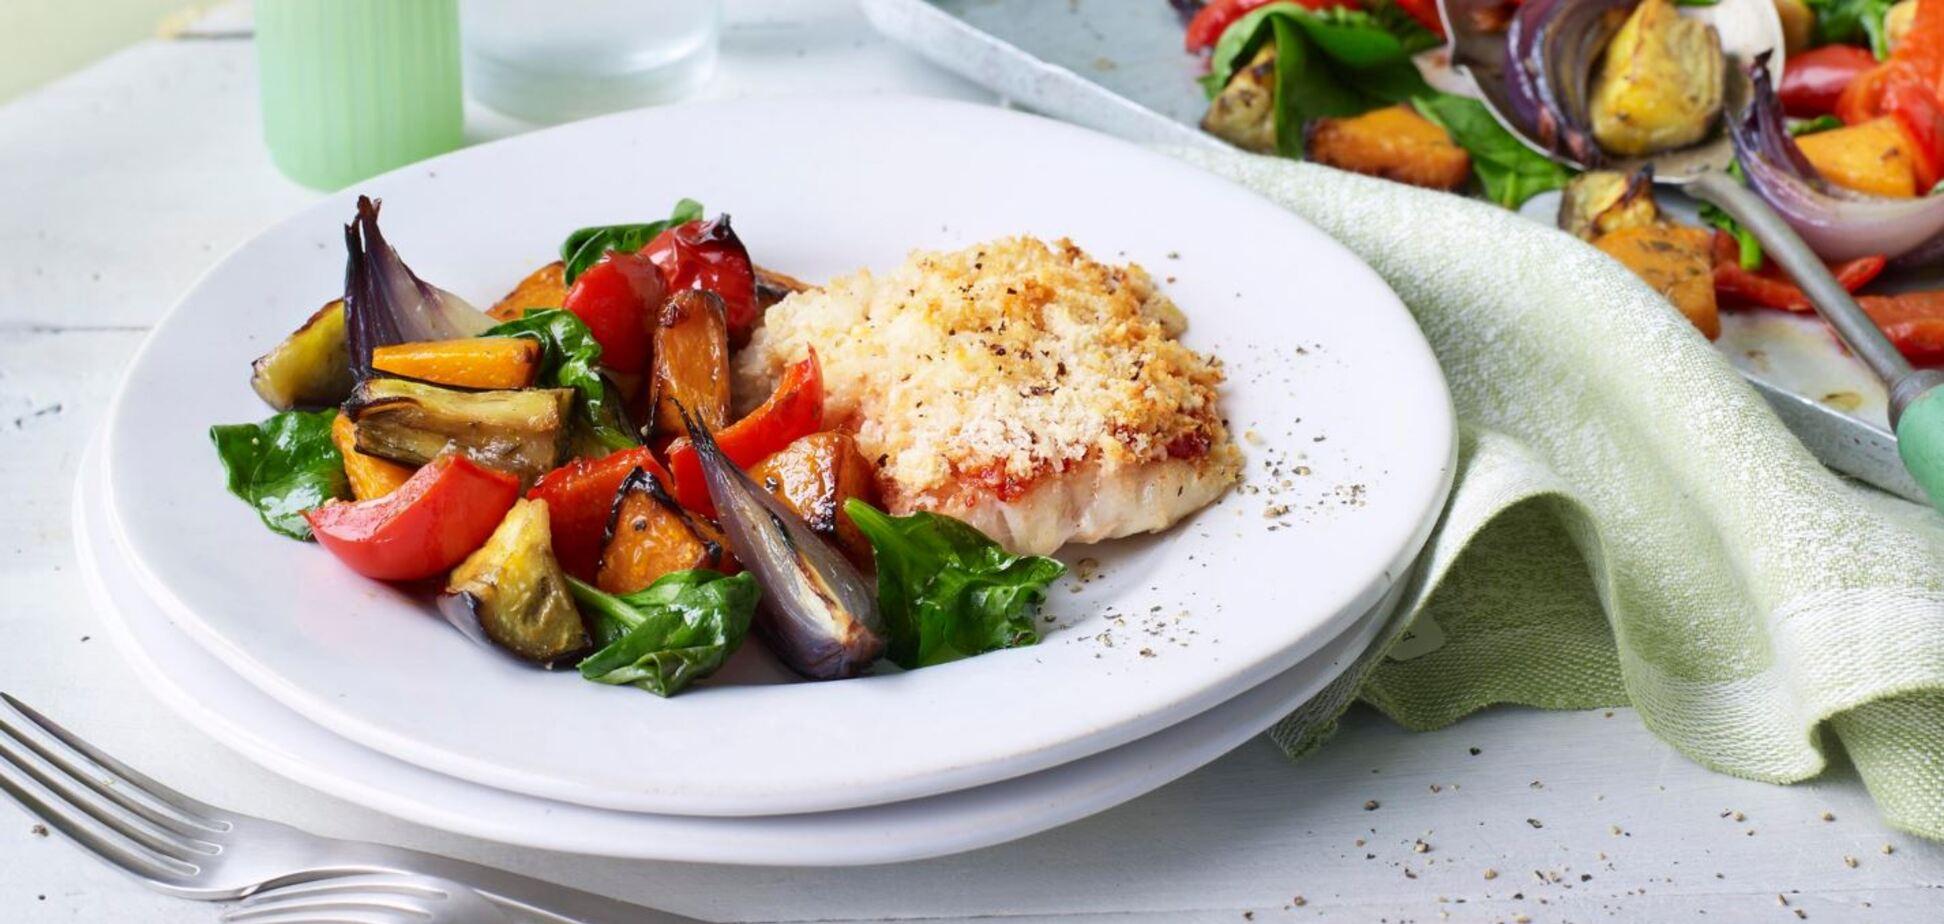 Рецепт казково смачної риби, запеченої у духовці